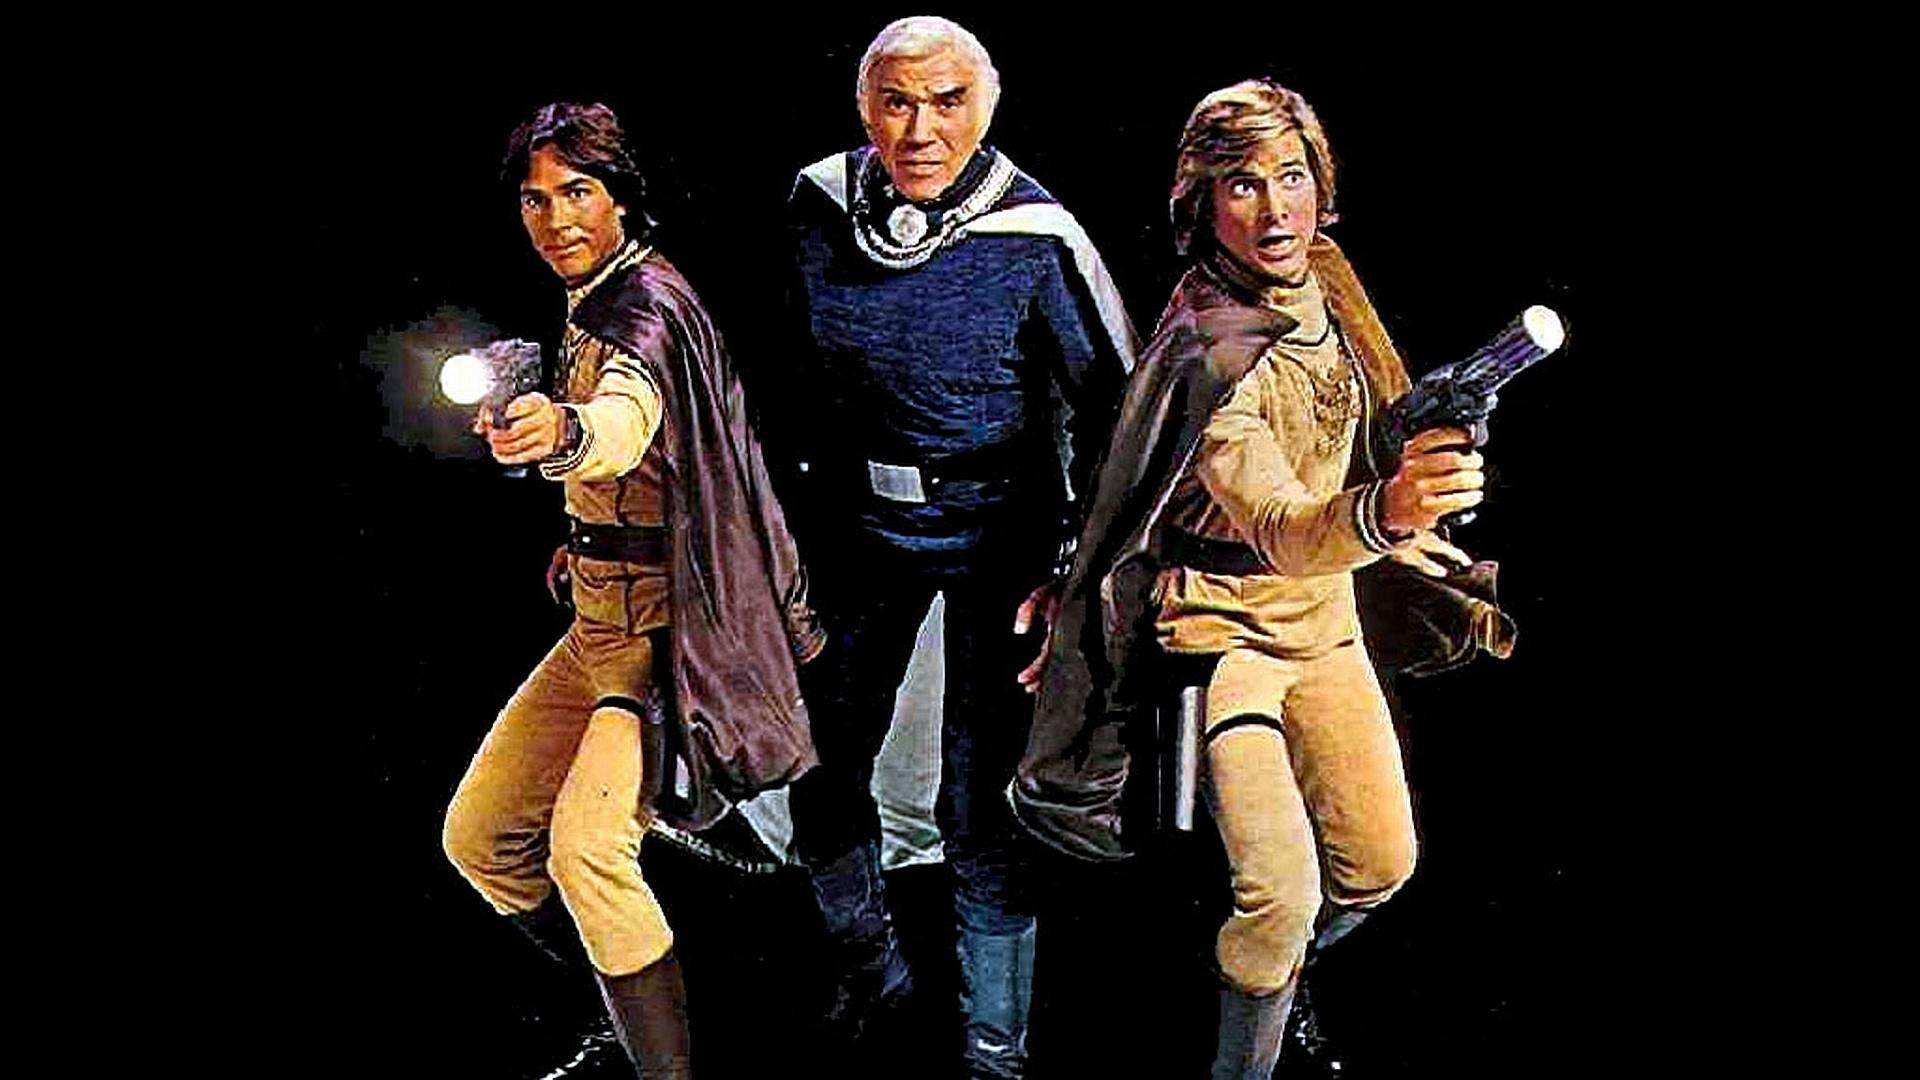 Battlestar Galactica (1978) wallpapers HD quality